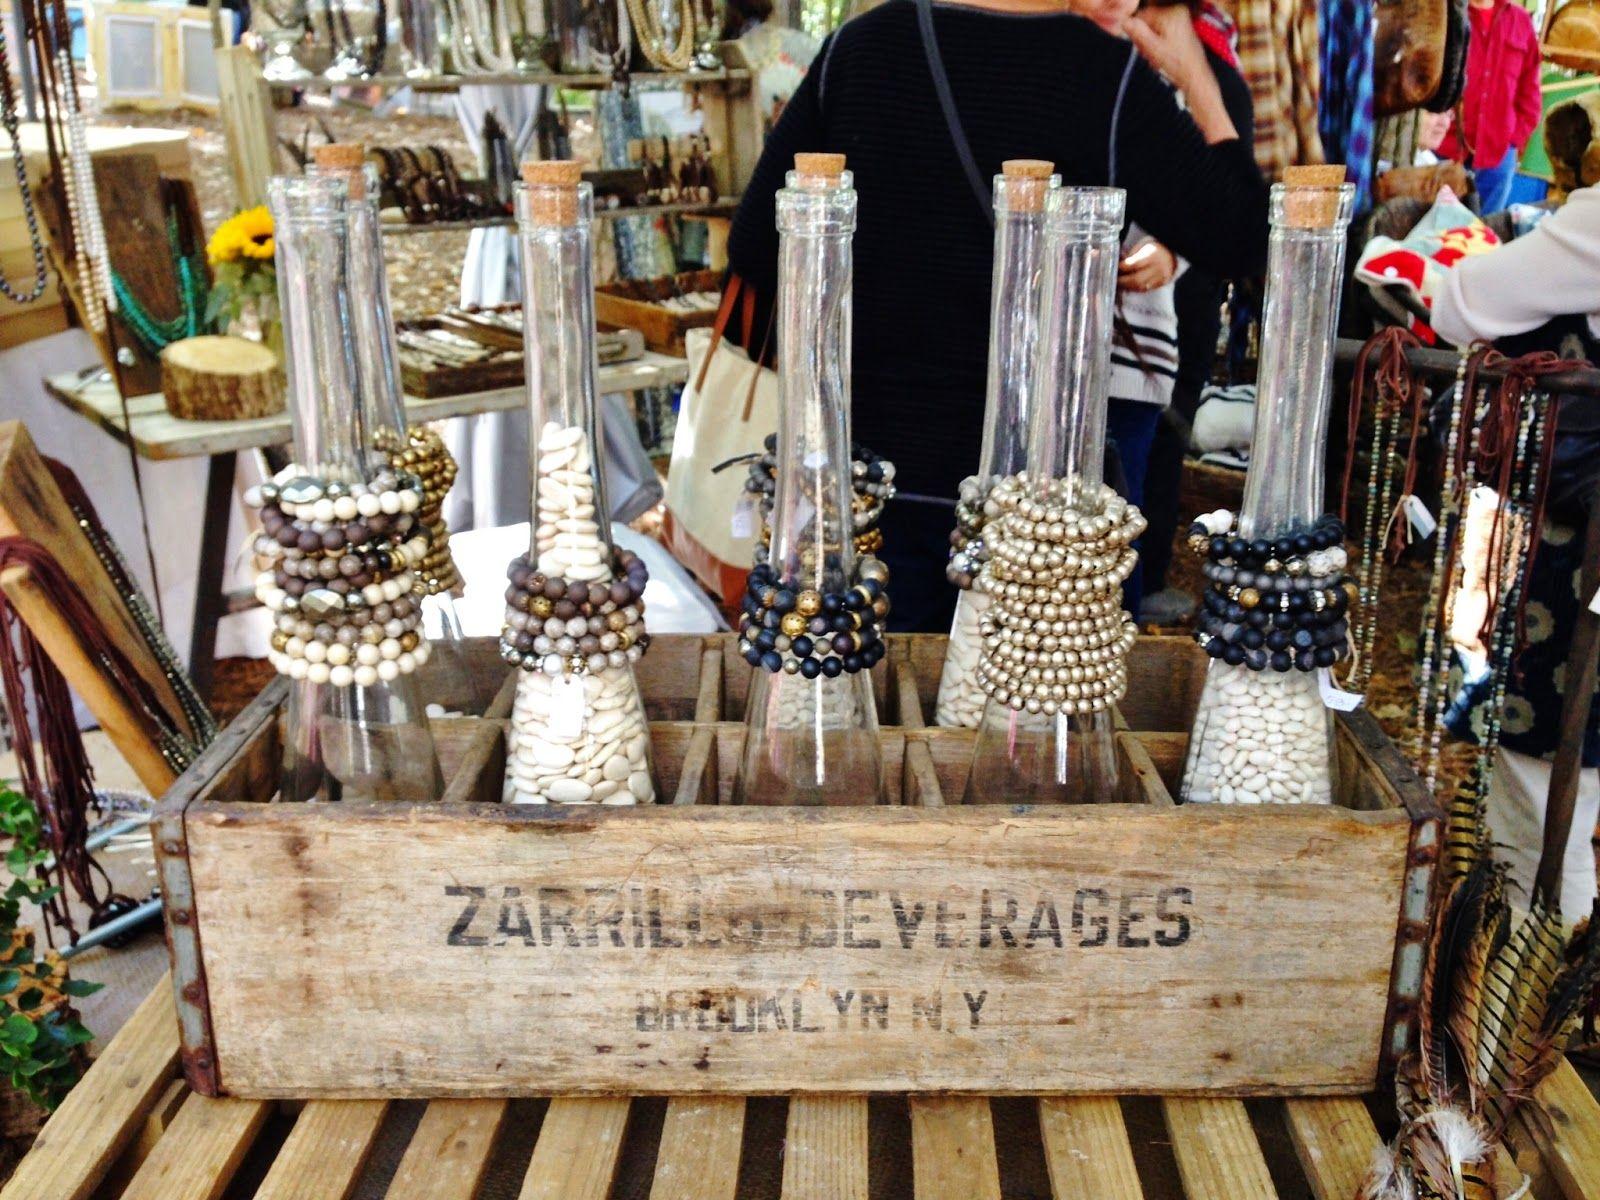 Bracelet Display Idea For A Vintage Vibe At Craft Fair